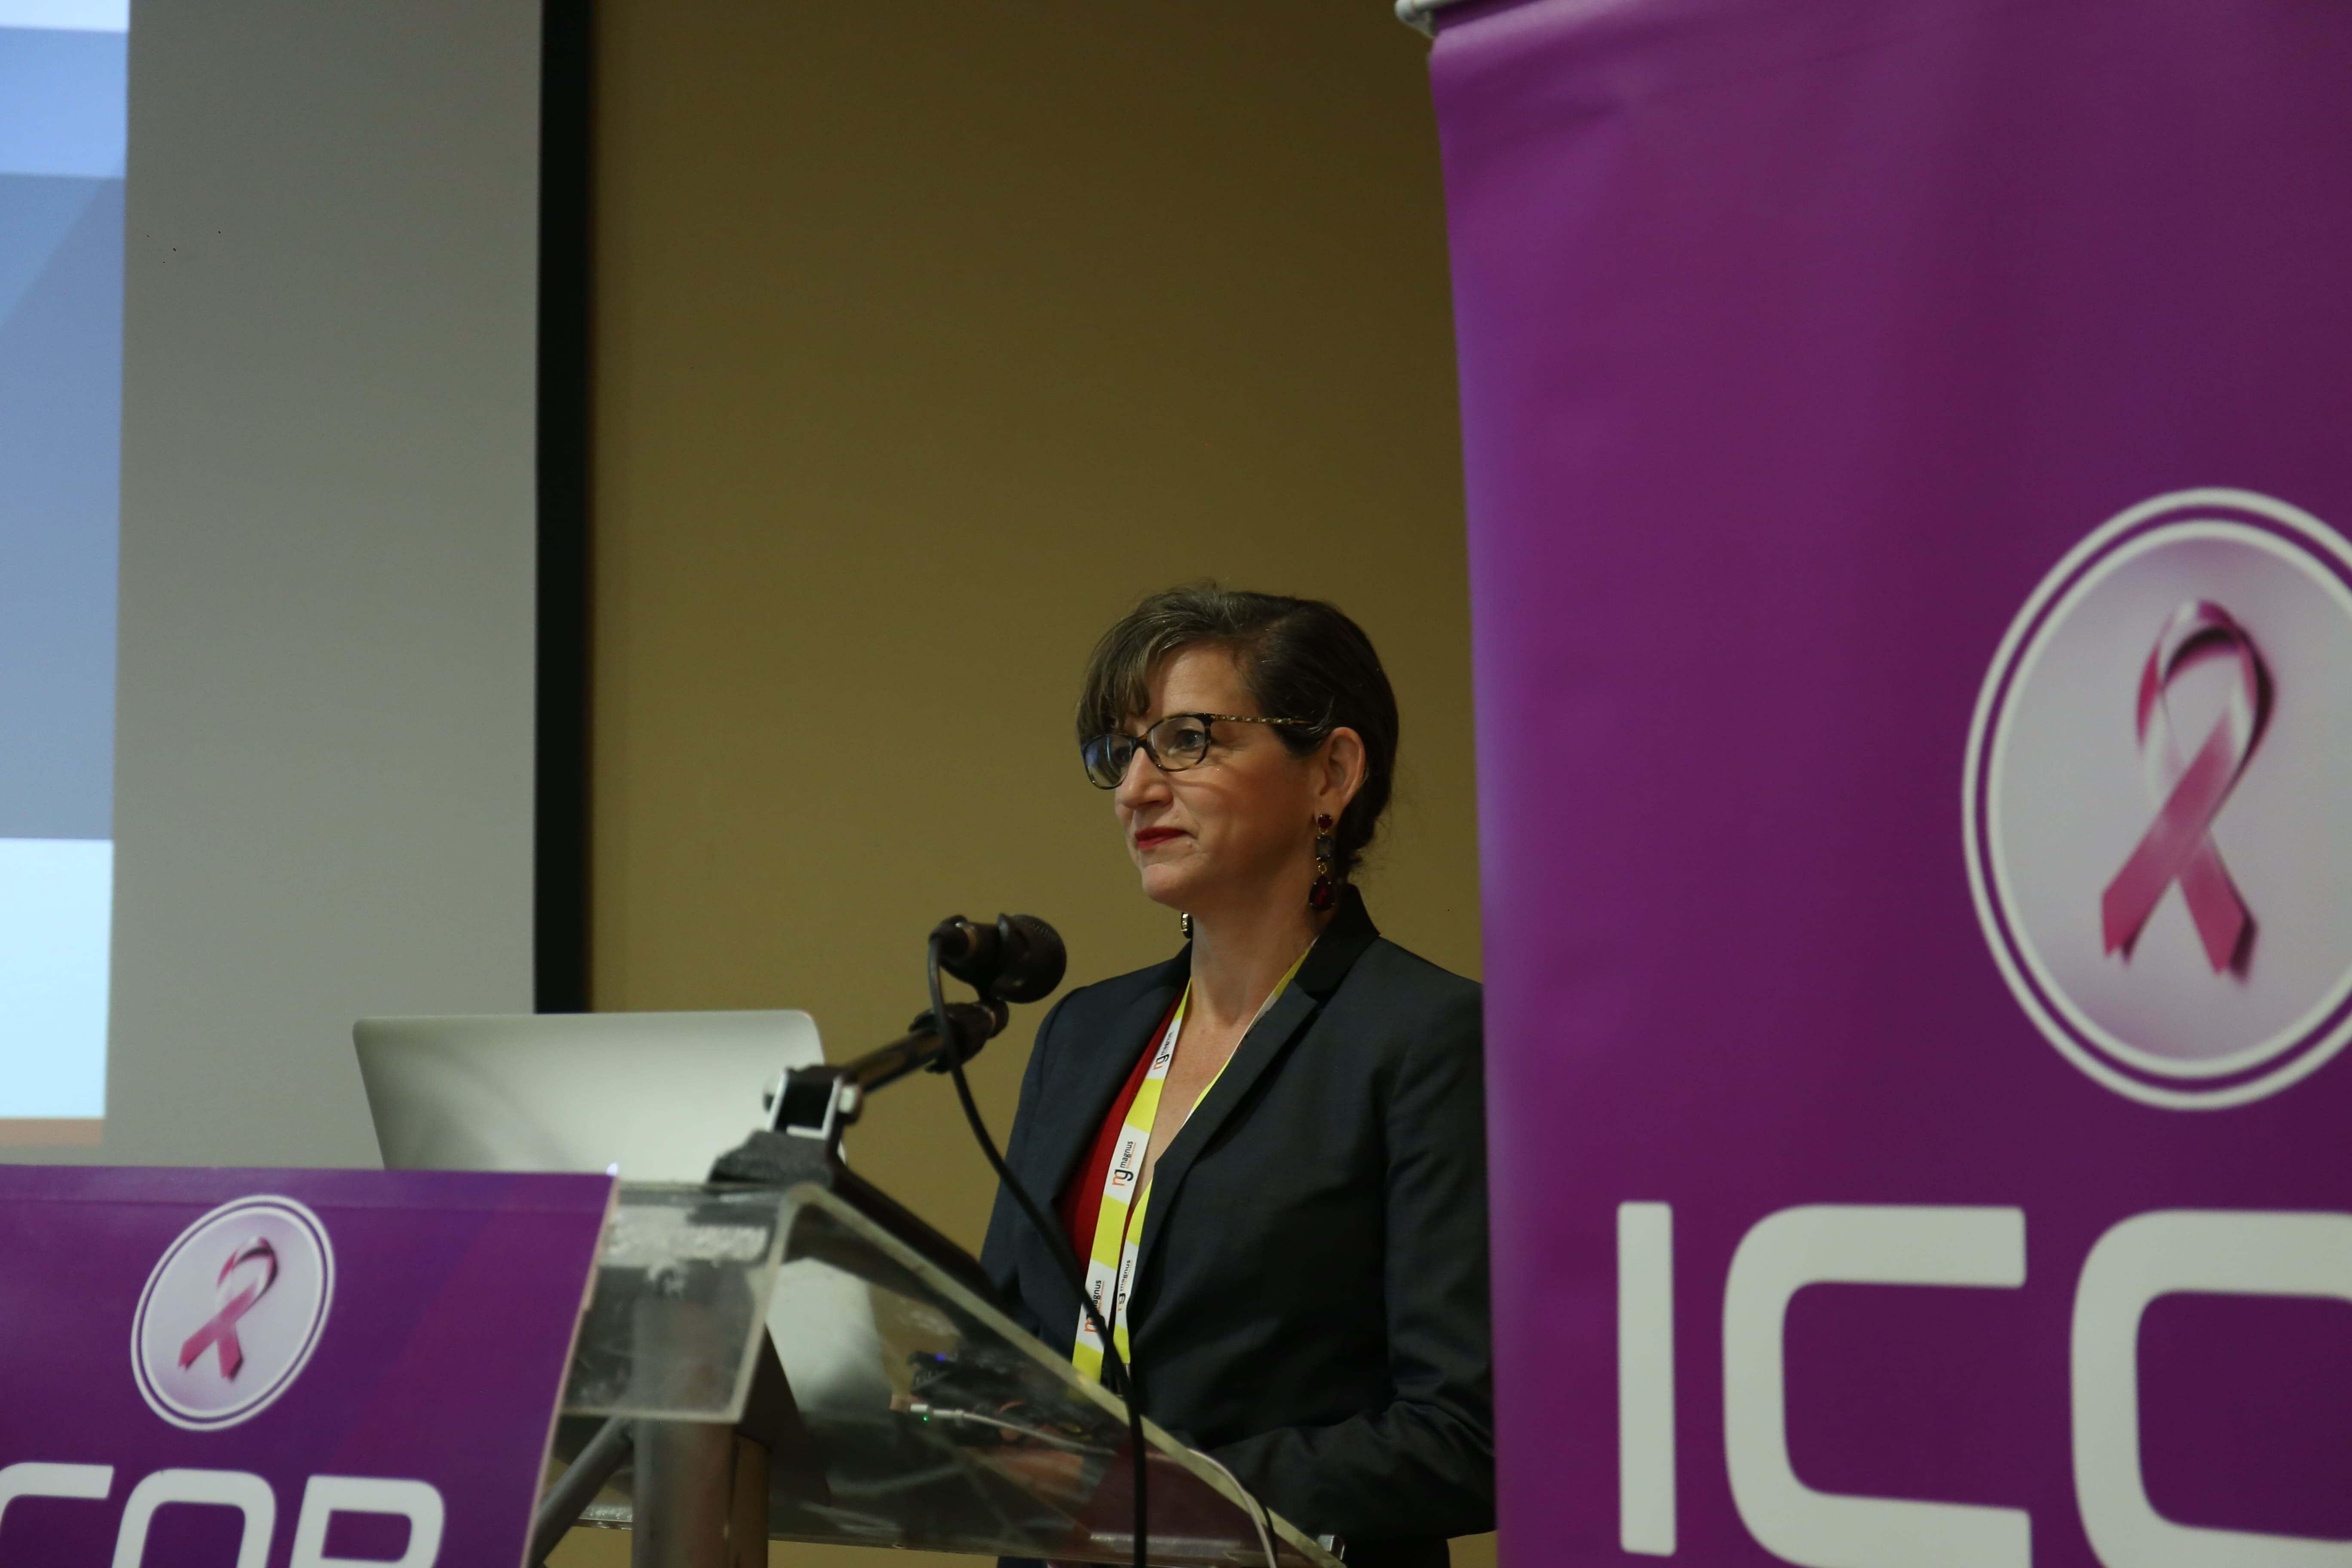 Cancer Conferences - Elizabeth Franzmann